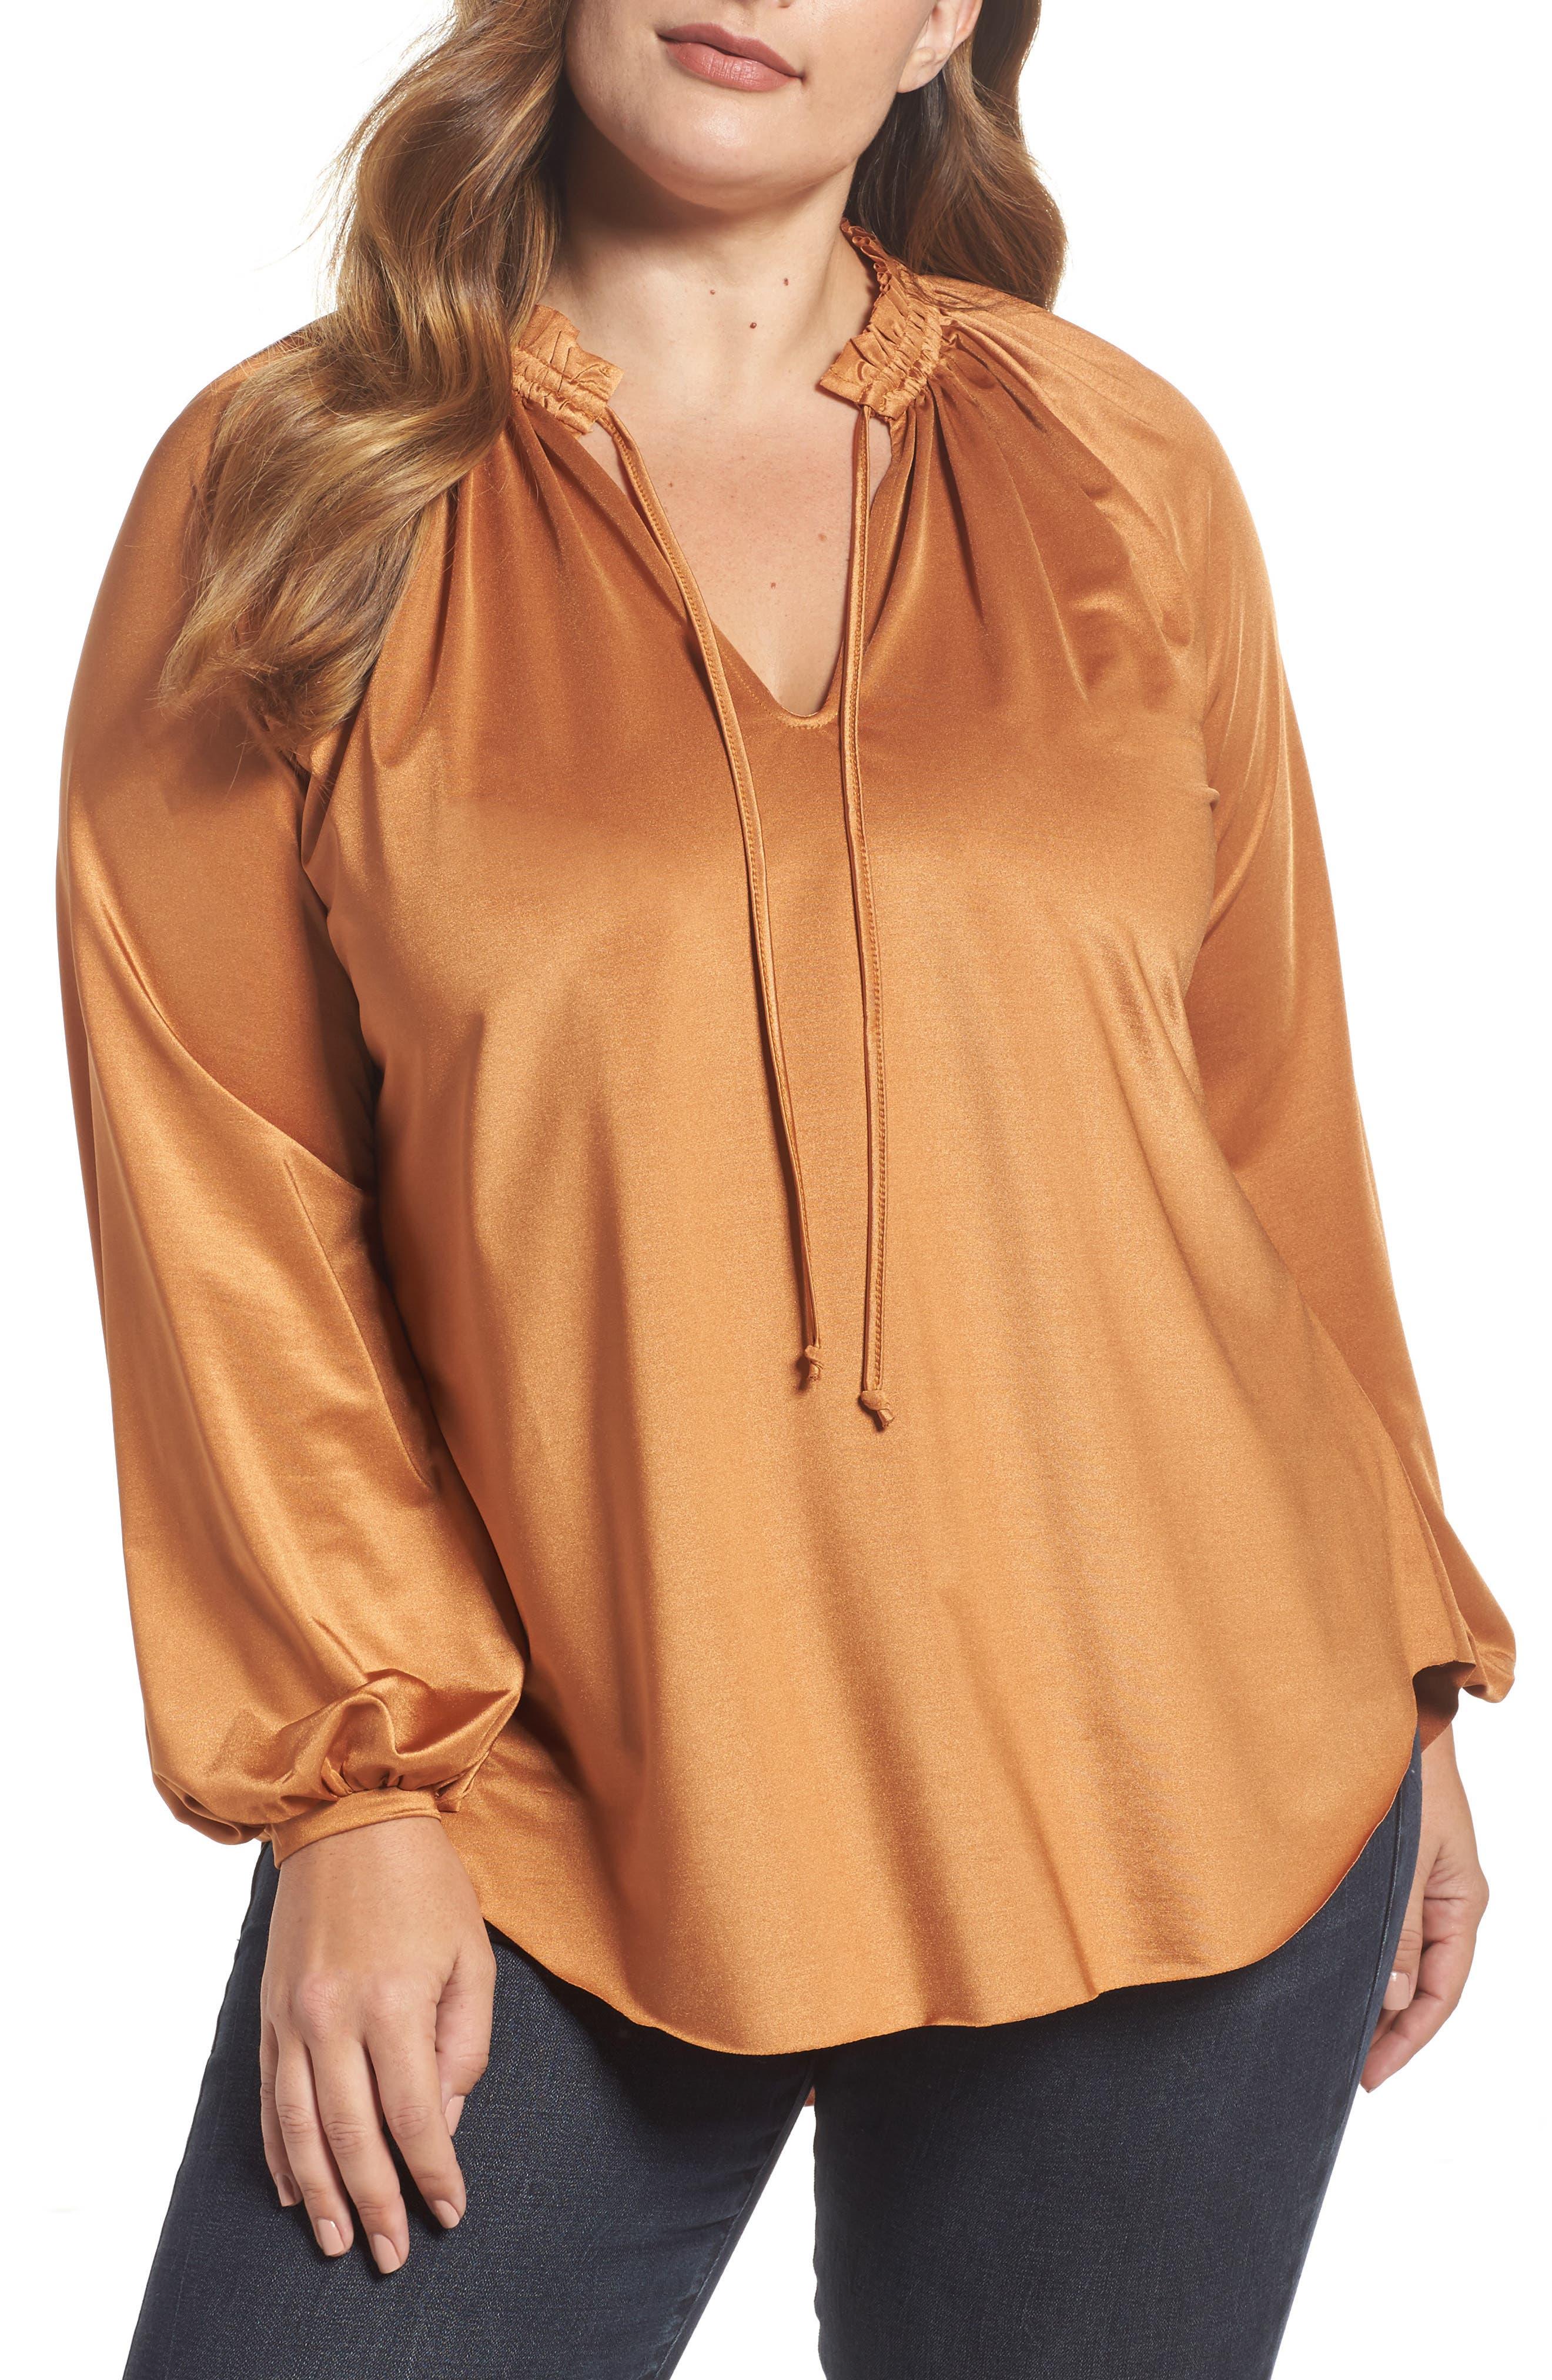 Alternate Image 1 Selected - Melissa McCarthy Tie Neck Top (Plus Size)